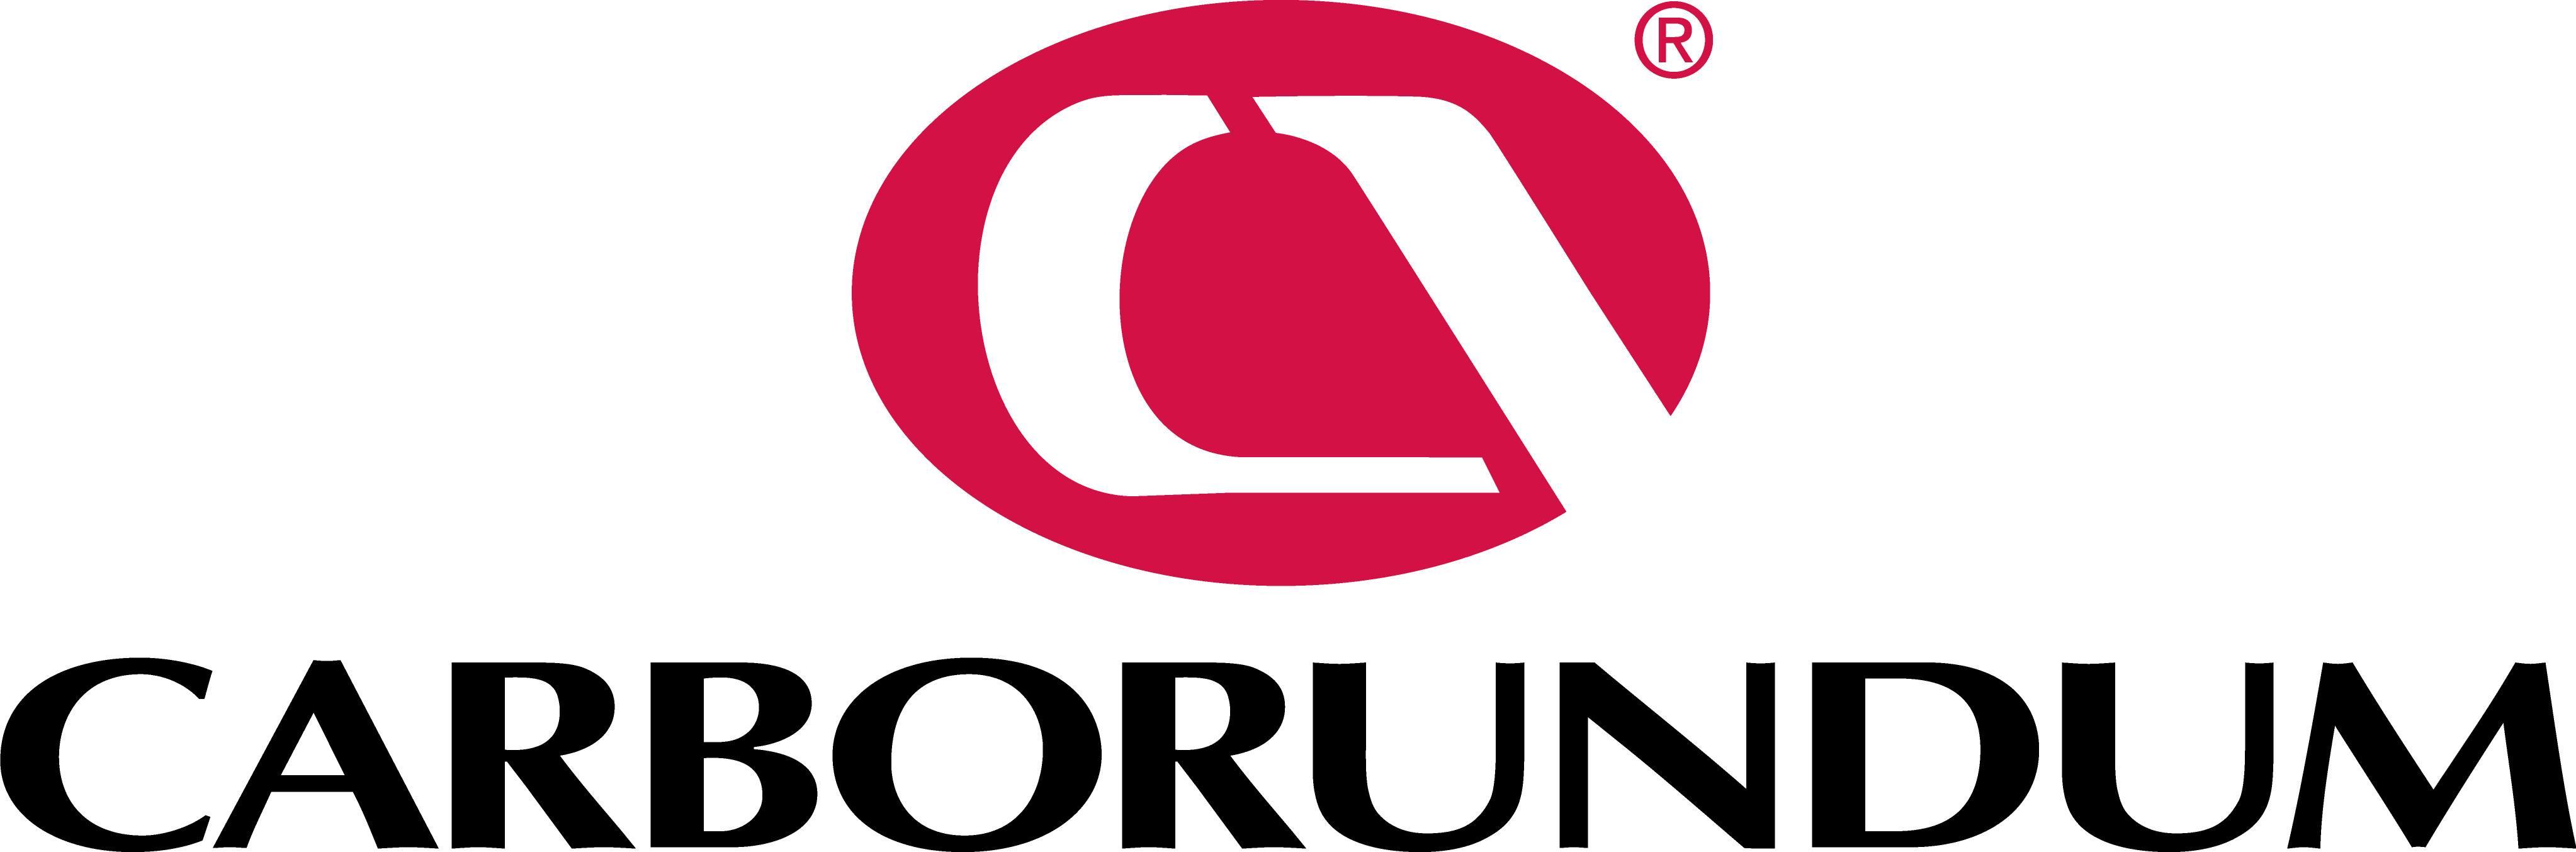 logo-carborundum-cmyk.jpg